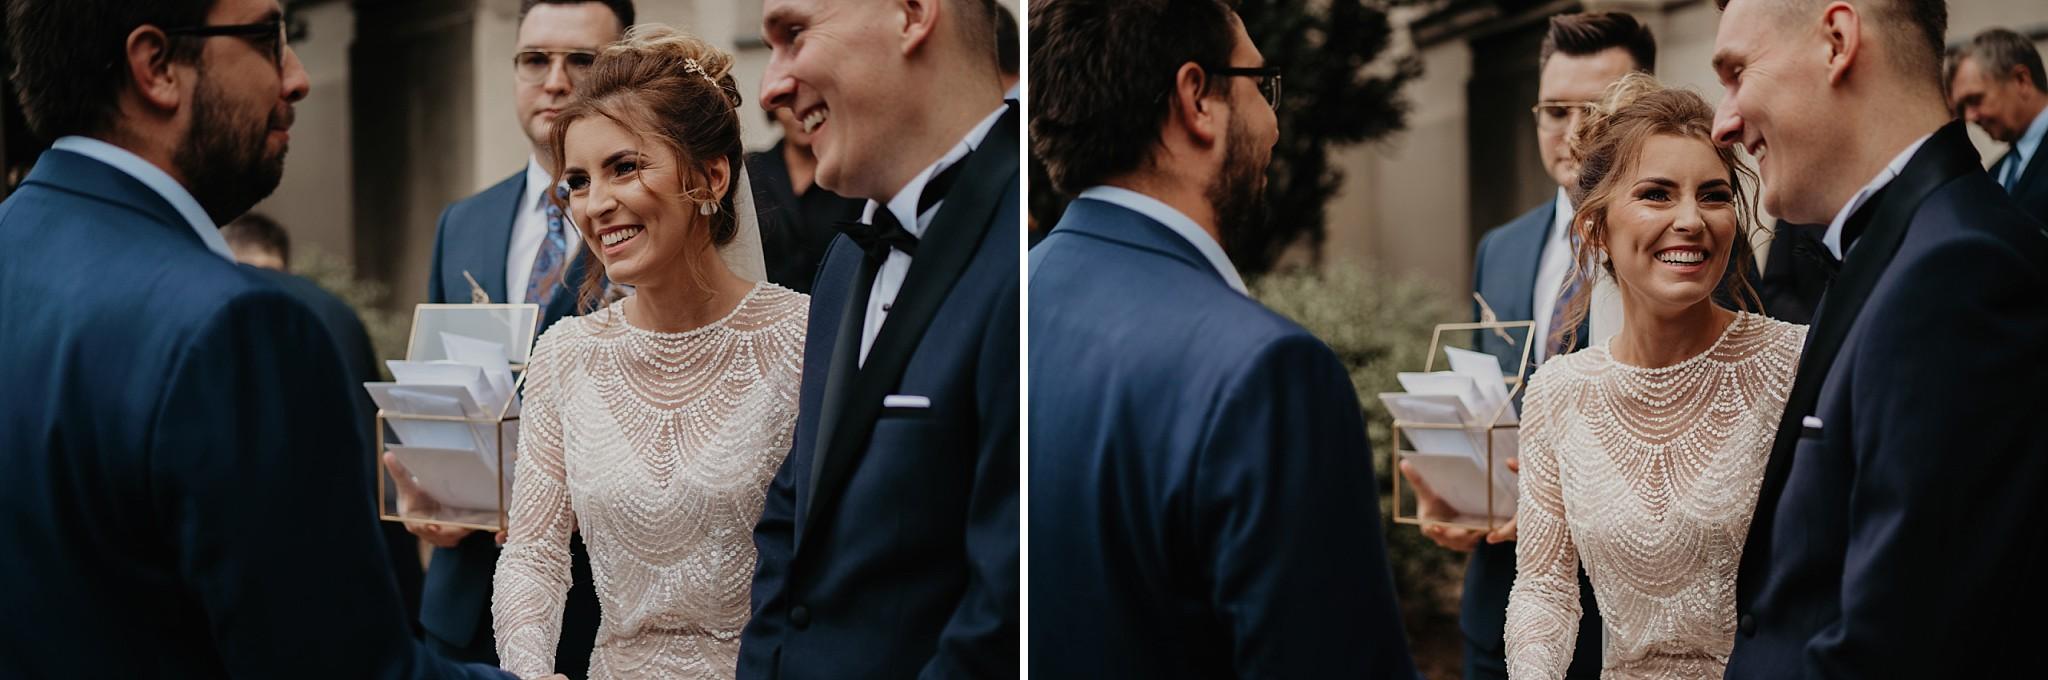 fotograf poznan wesele dobra truskawka piekne wesele pod poznaniem wesele w dobrej truskawce piekna para mloda slub marzen slub koronawirus slub listopad wesele koronawirus 238